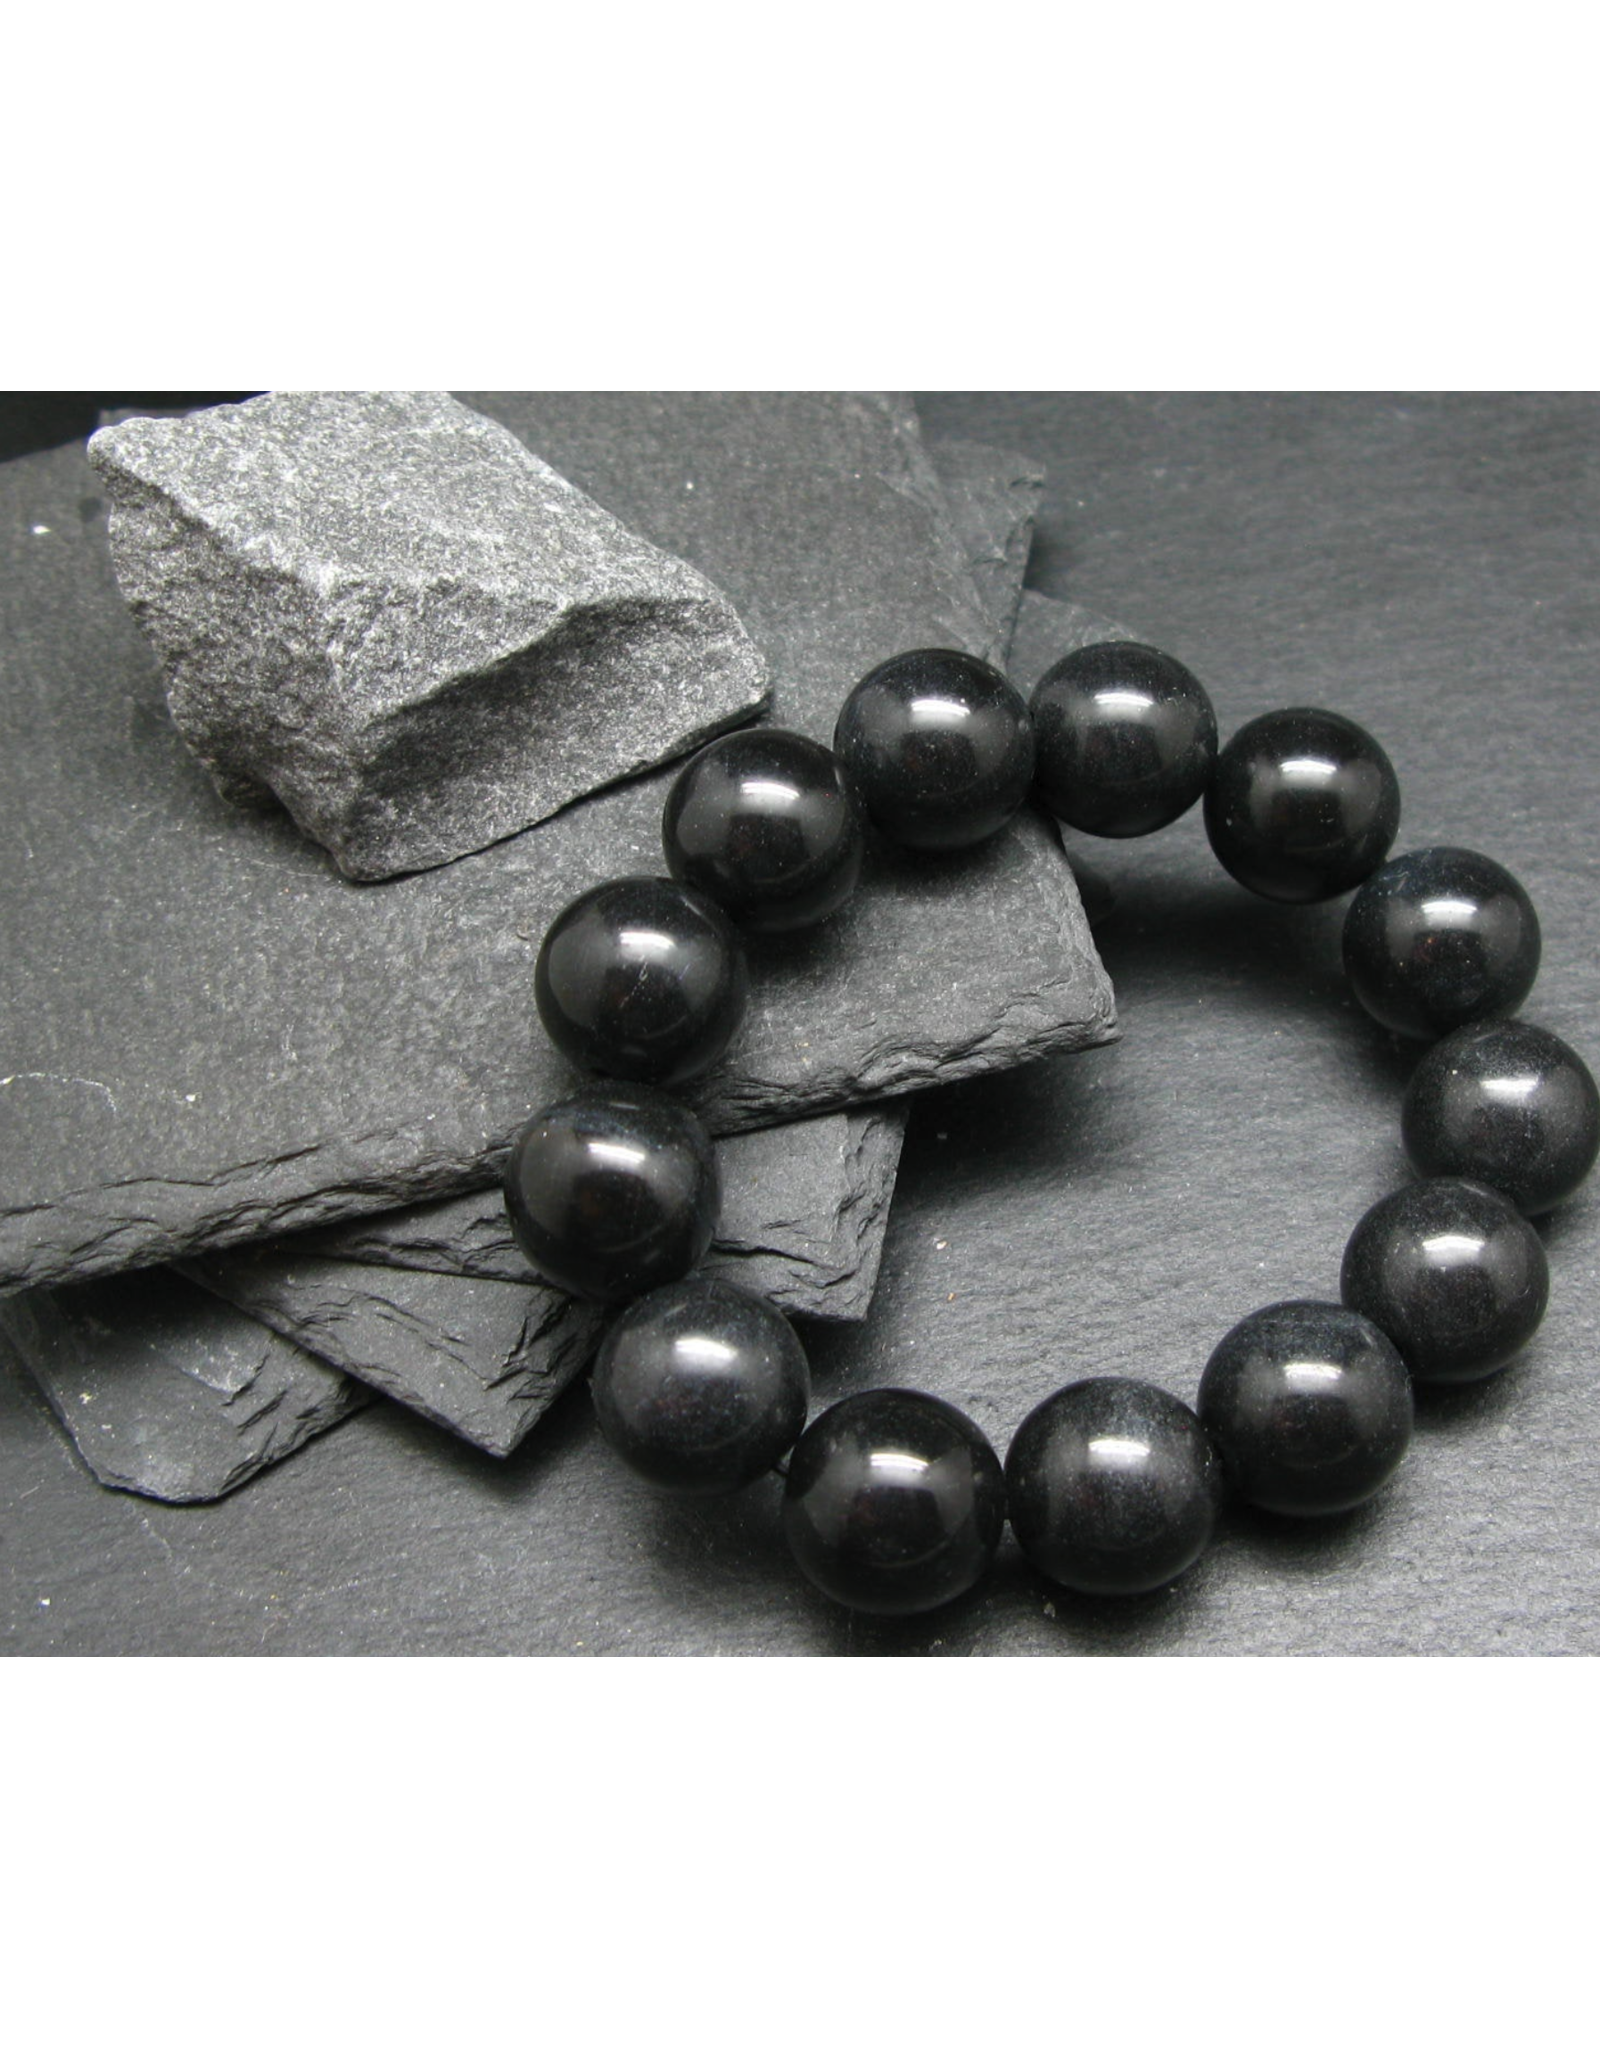 Black Azeztulite Bracelet - 16mm